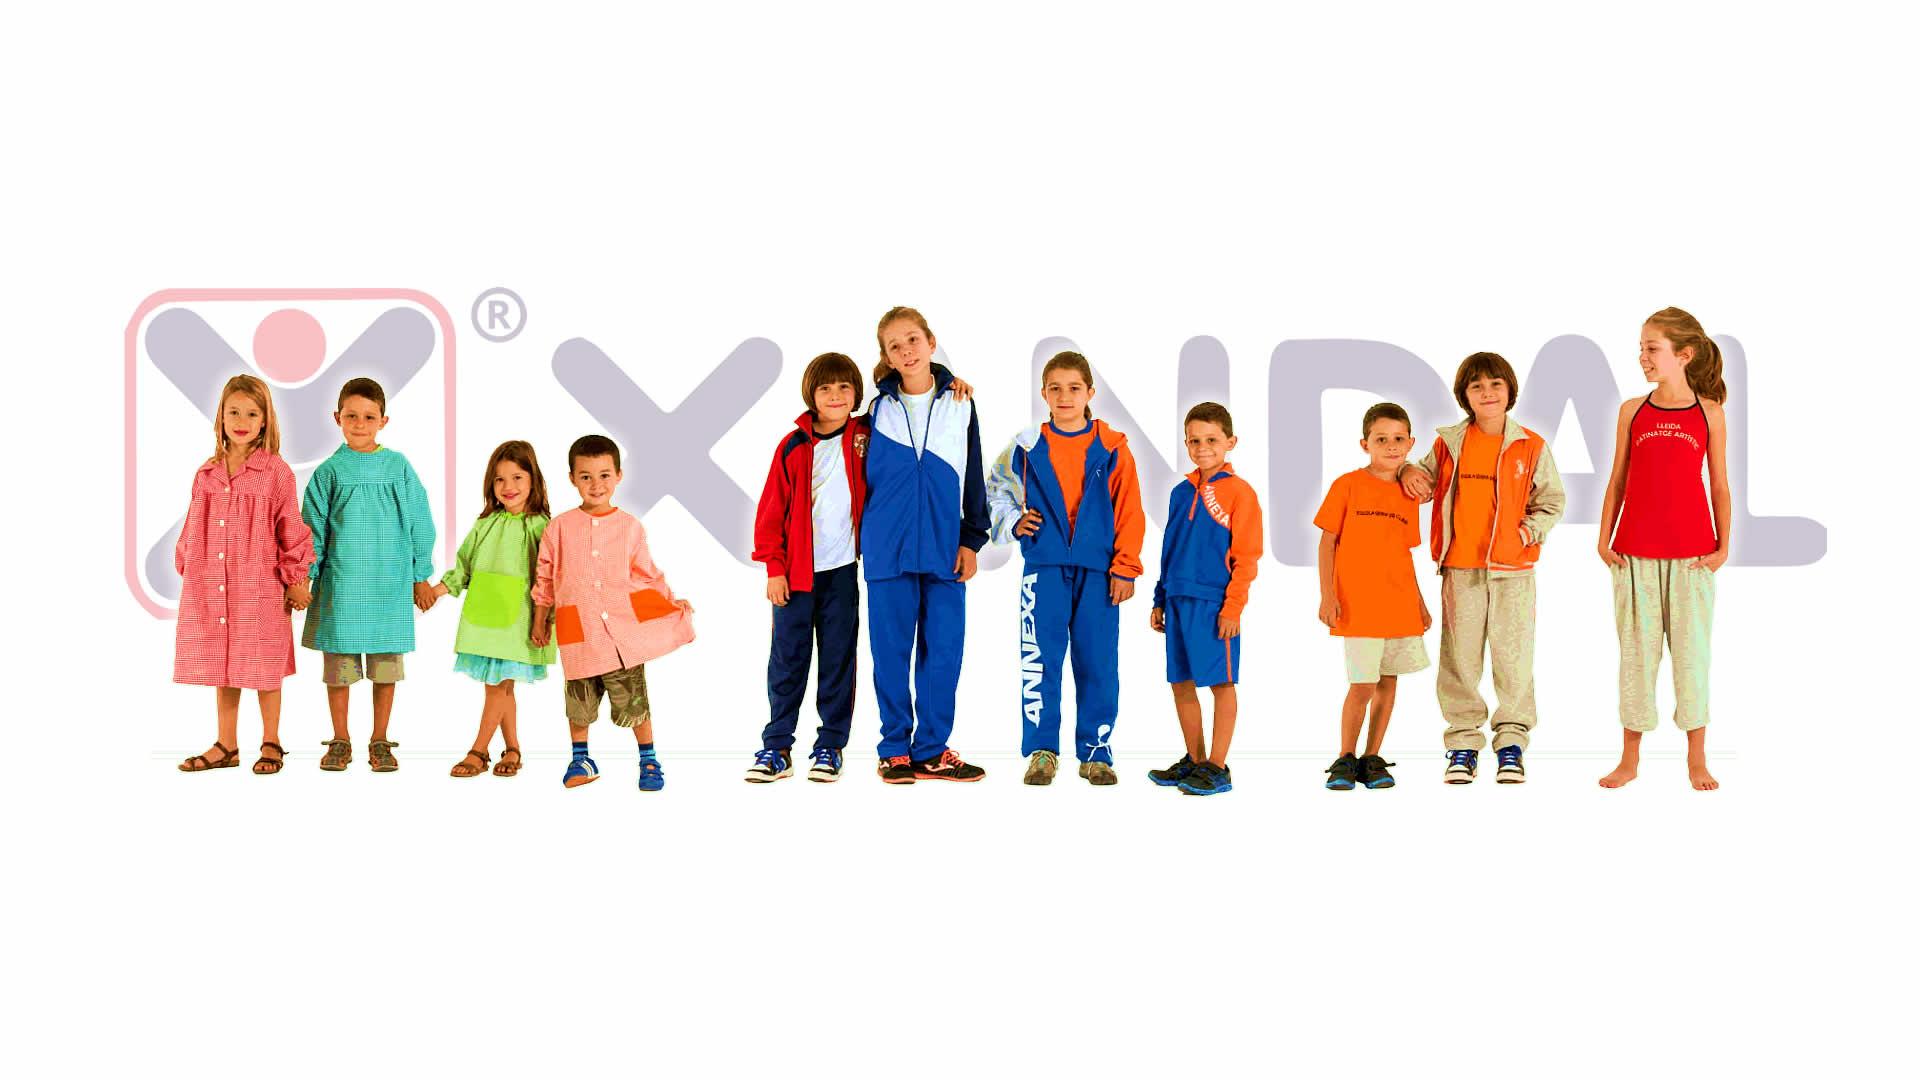 xandal.com-xandal.com-slide02 Roba escolar i roba esportiva a mida